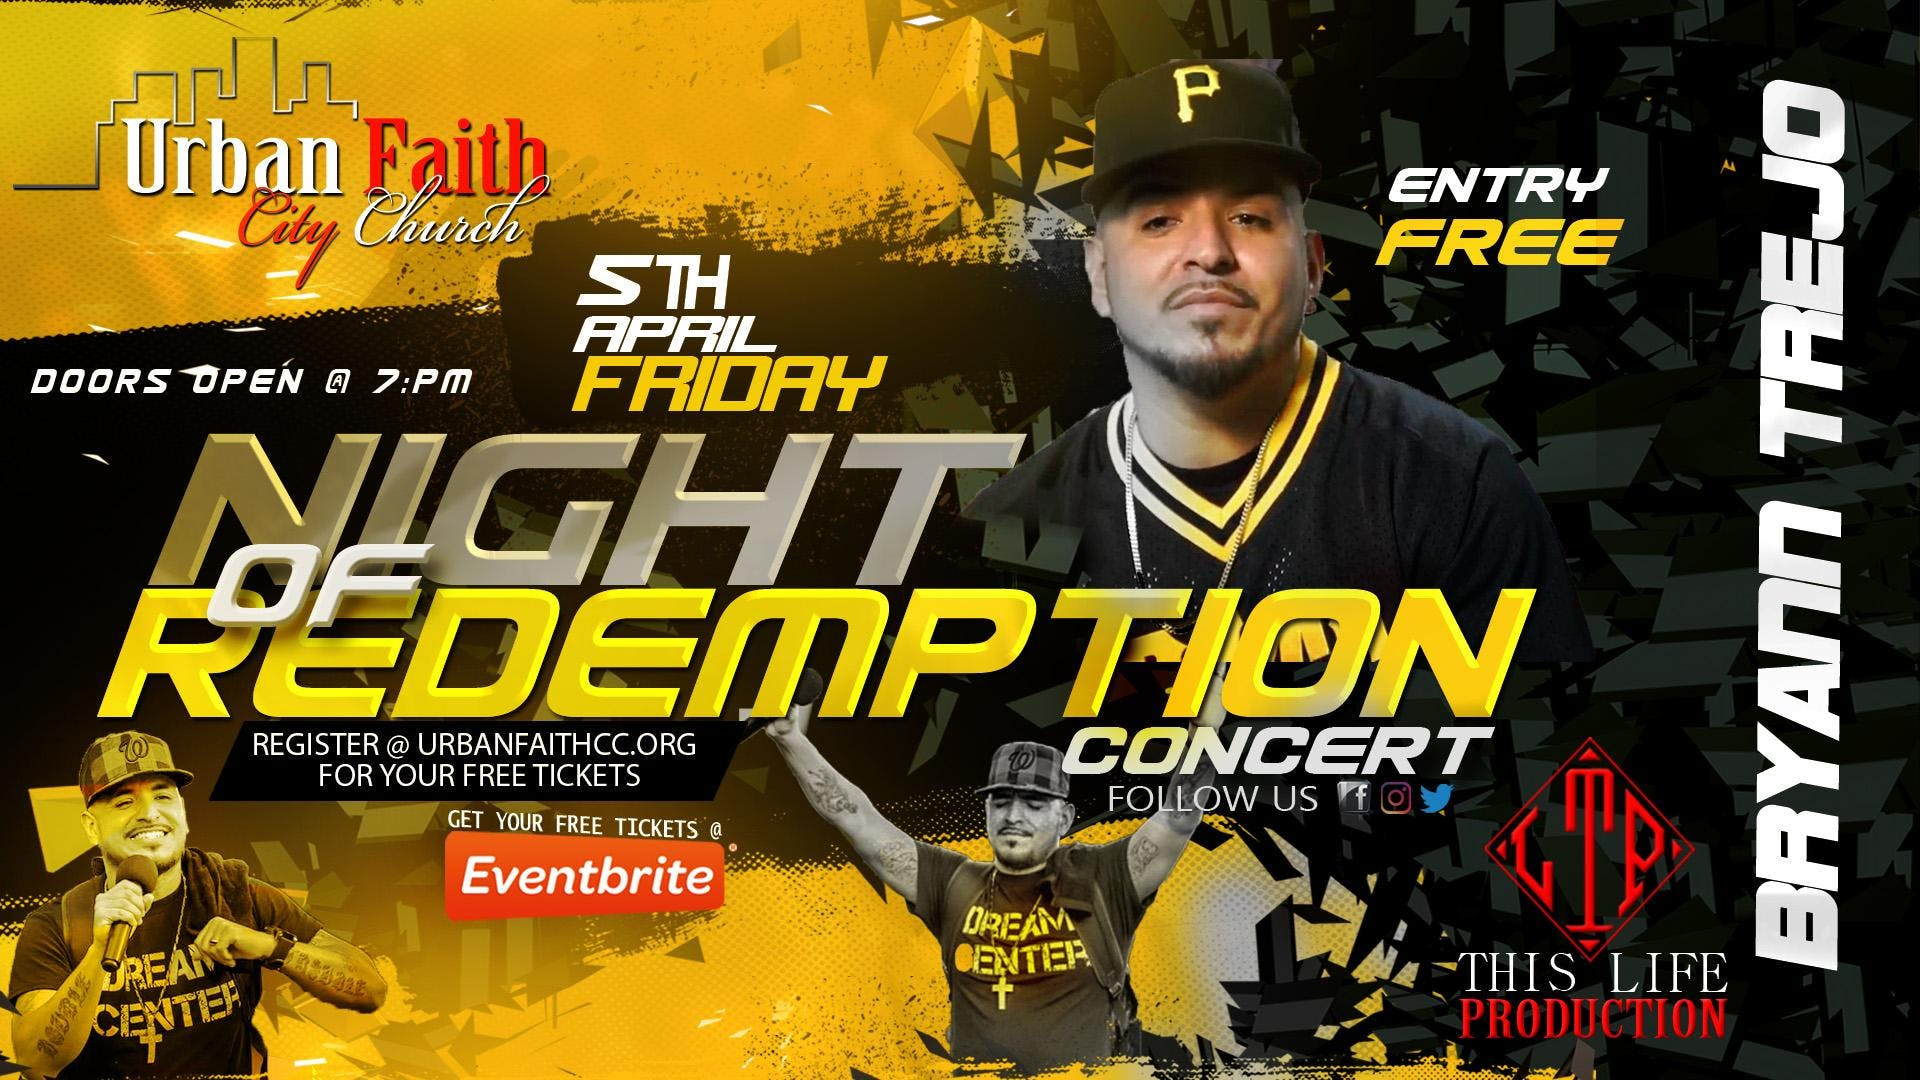 Night of Redemption